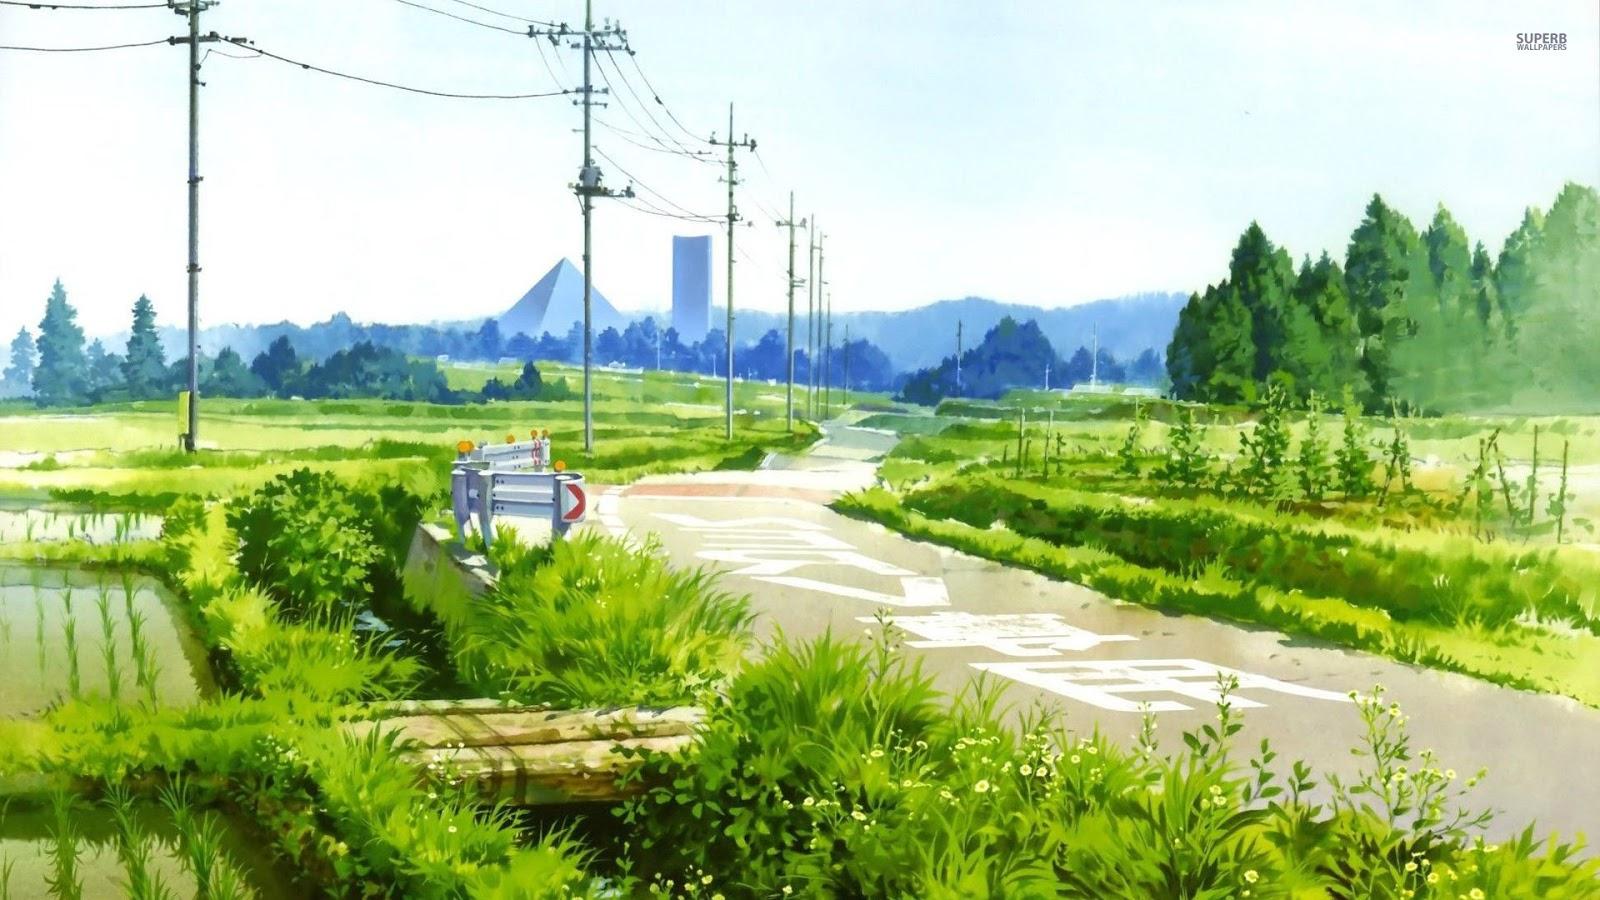 Frieden Lucette: Wallpaper #4 - Anime Scenery